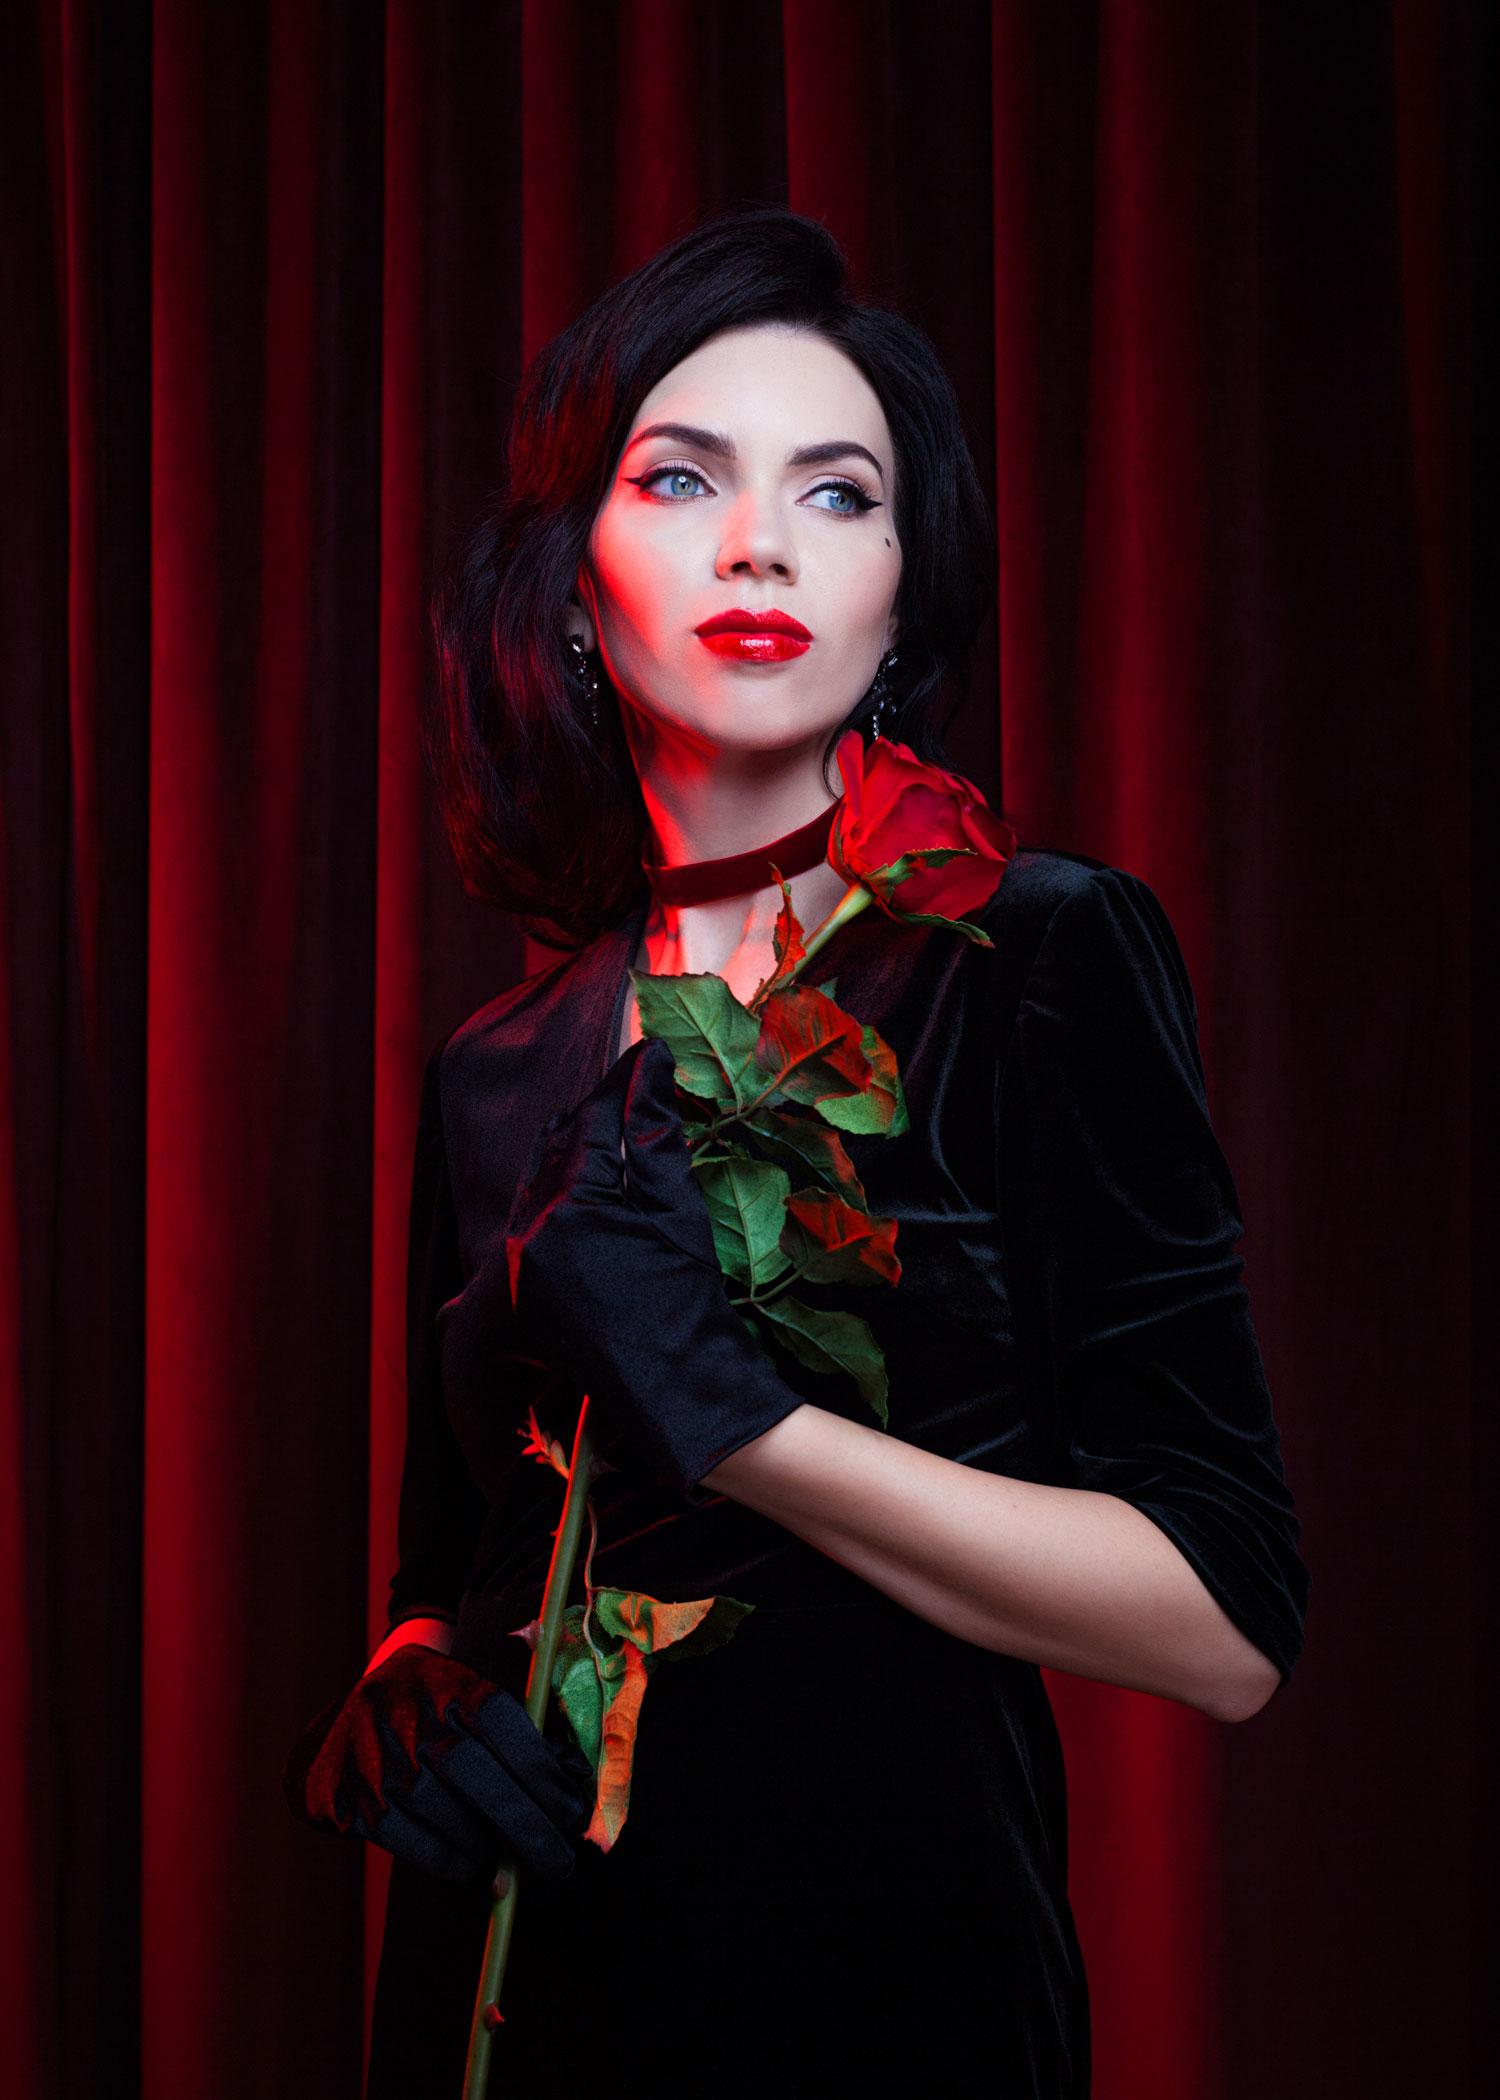 Фэшн фотограф -  Резеда Мурзаханова - визажист Олеся Чон